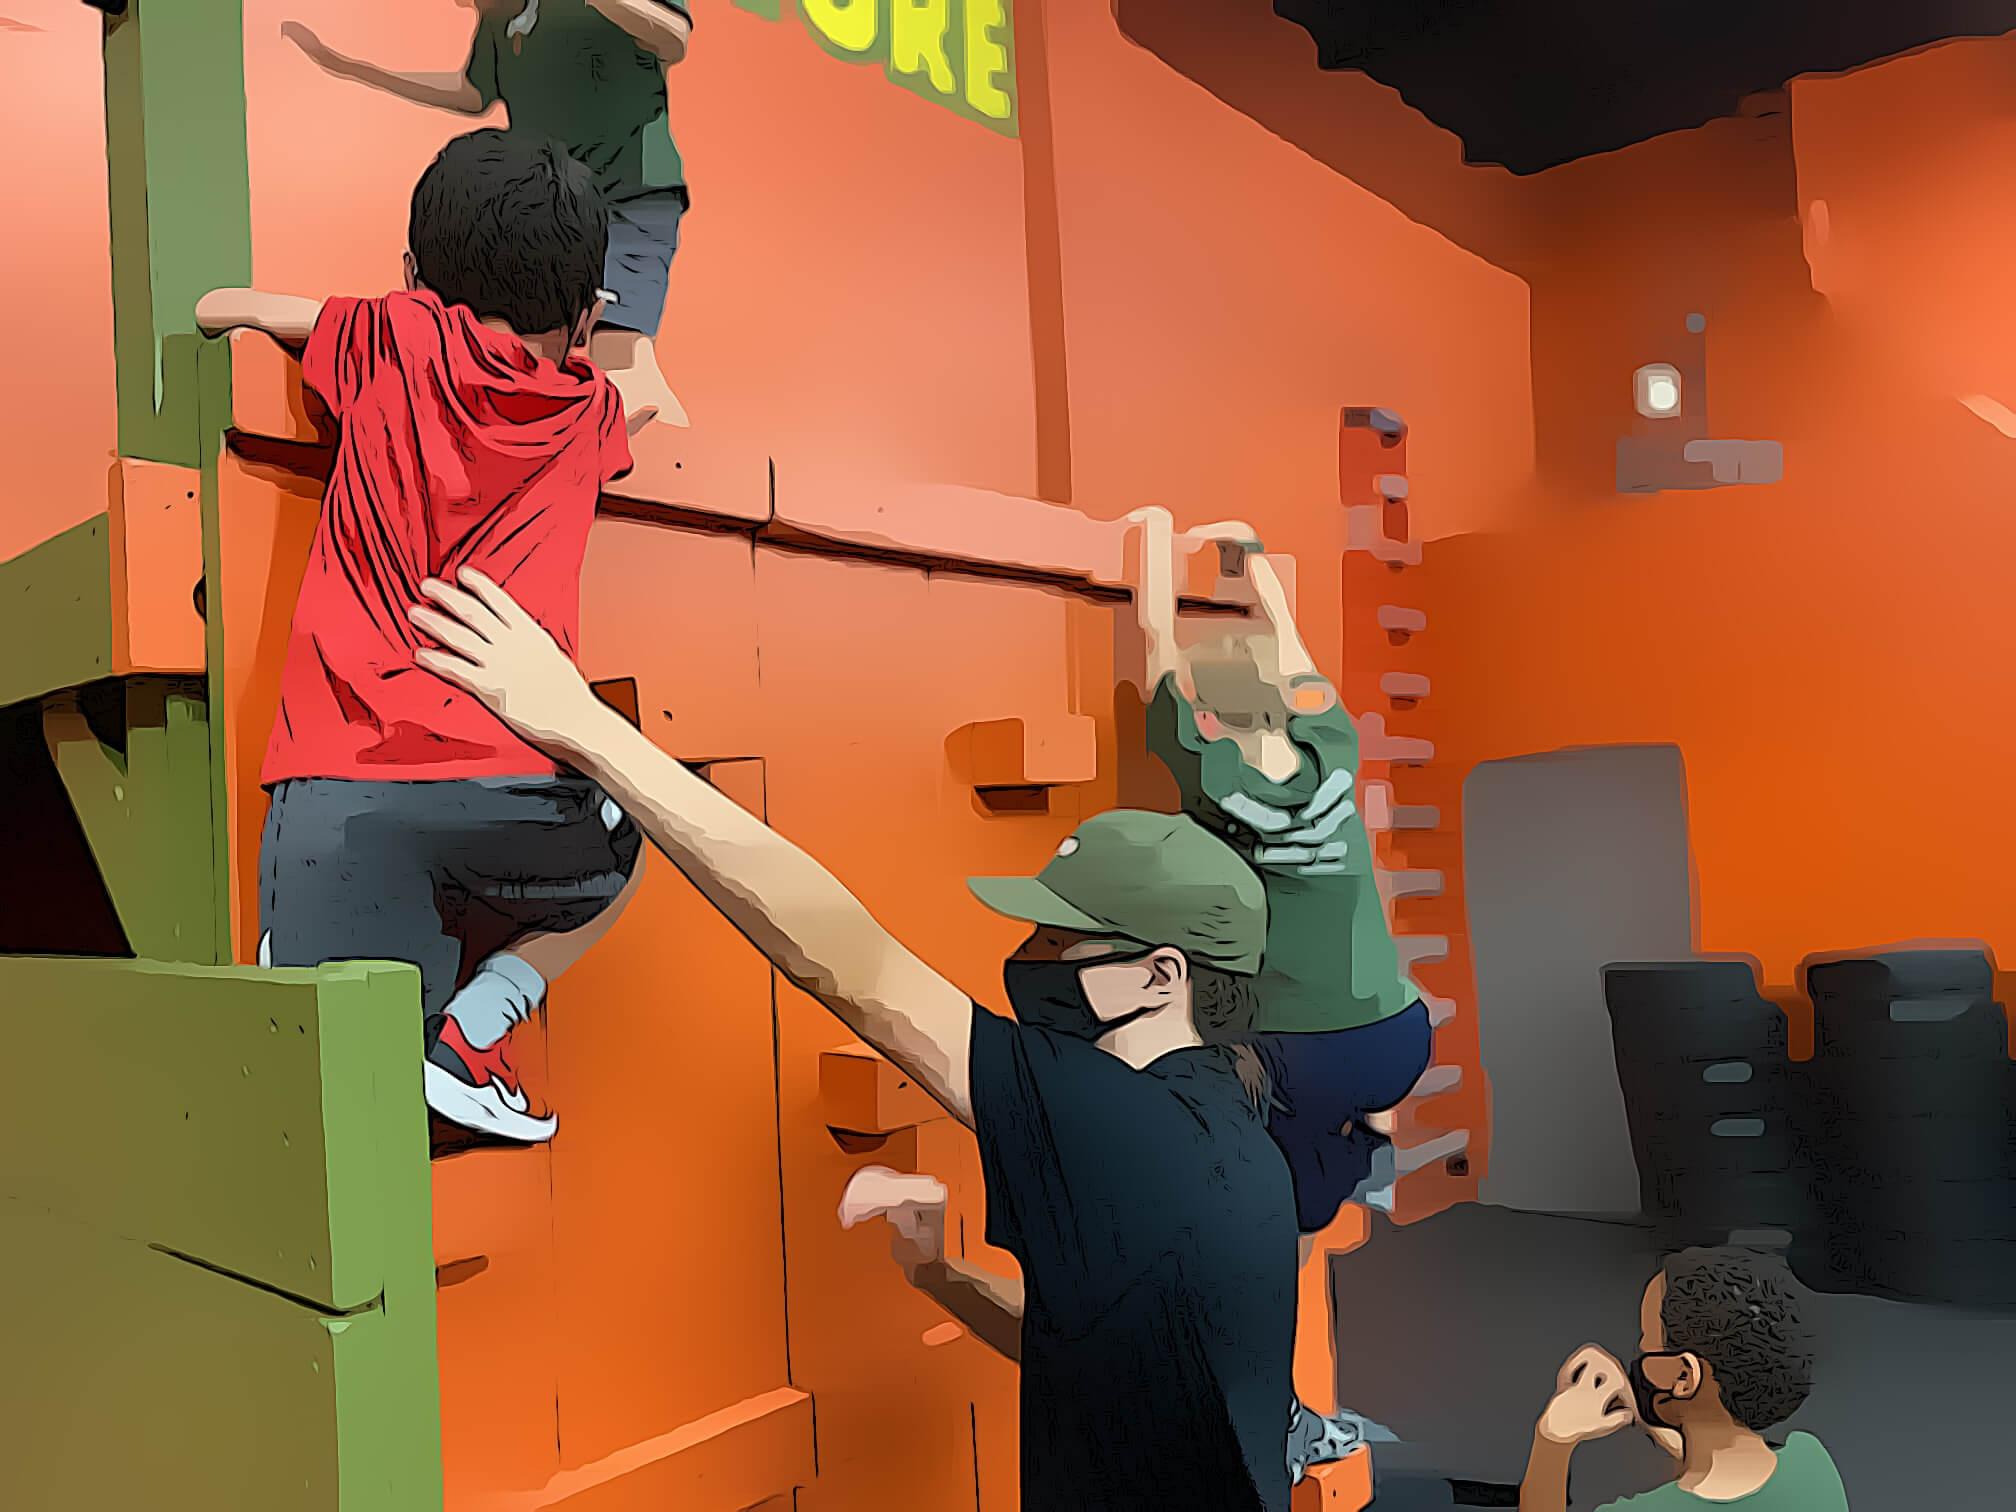 children climb over the wall